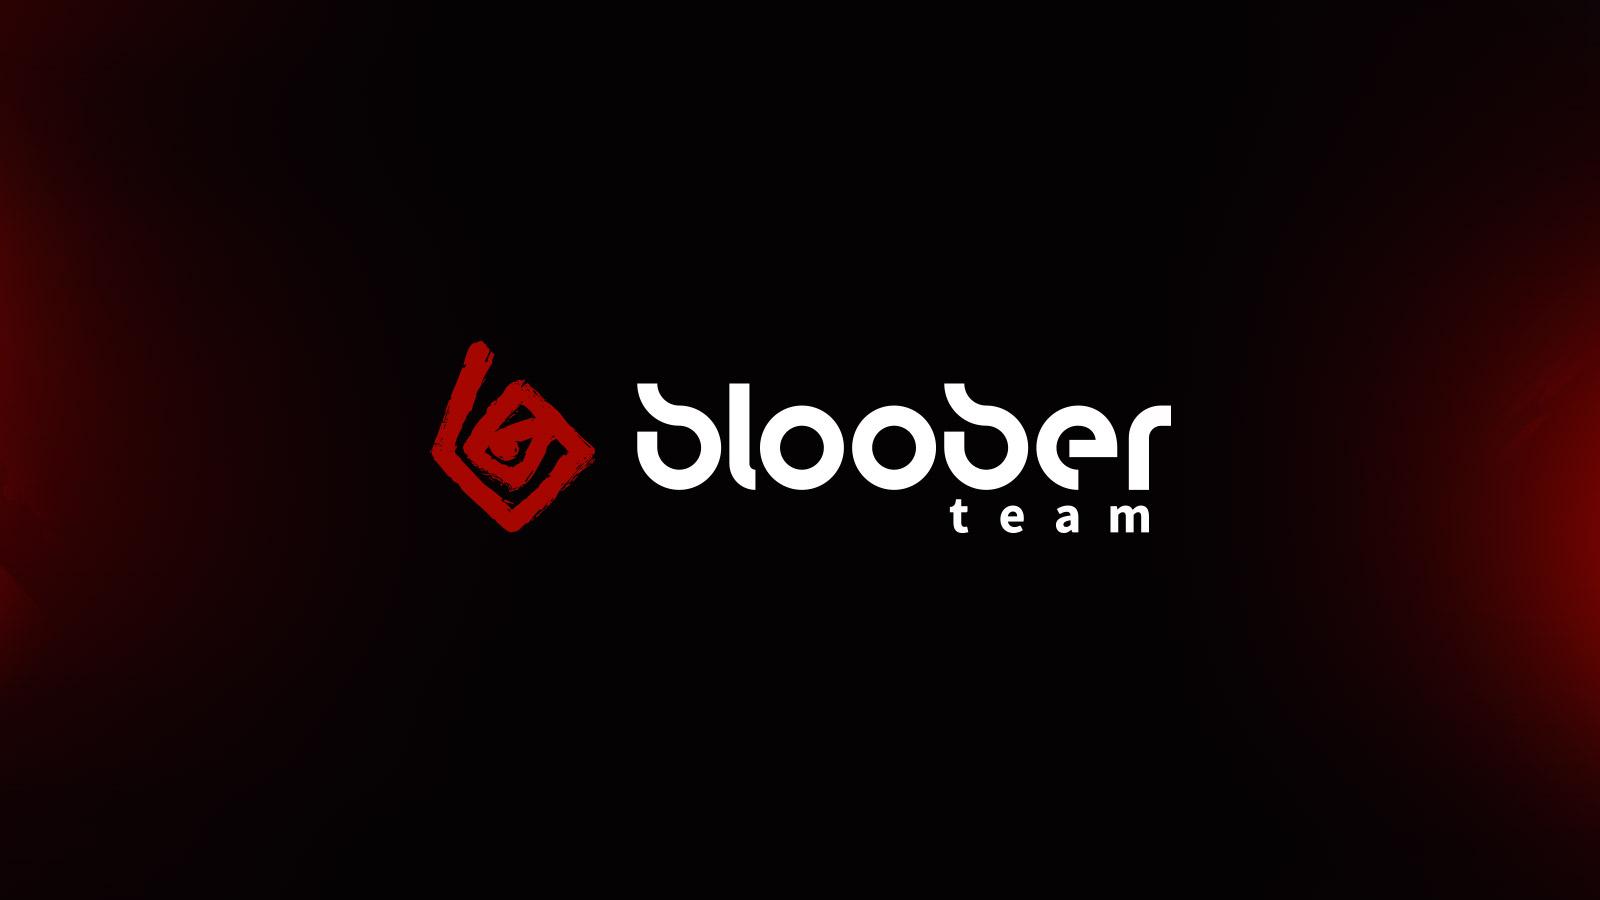 blooper team